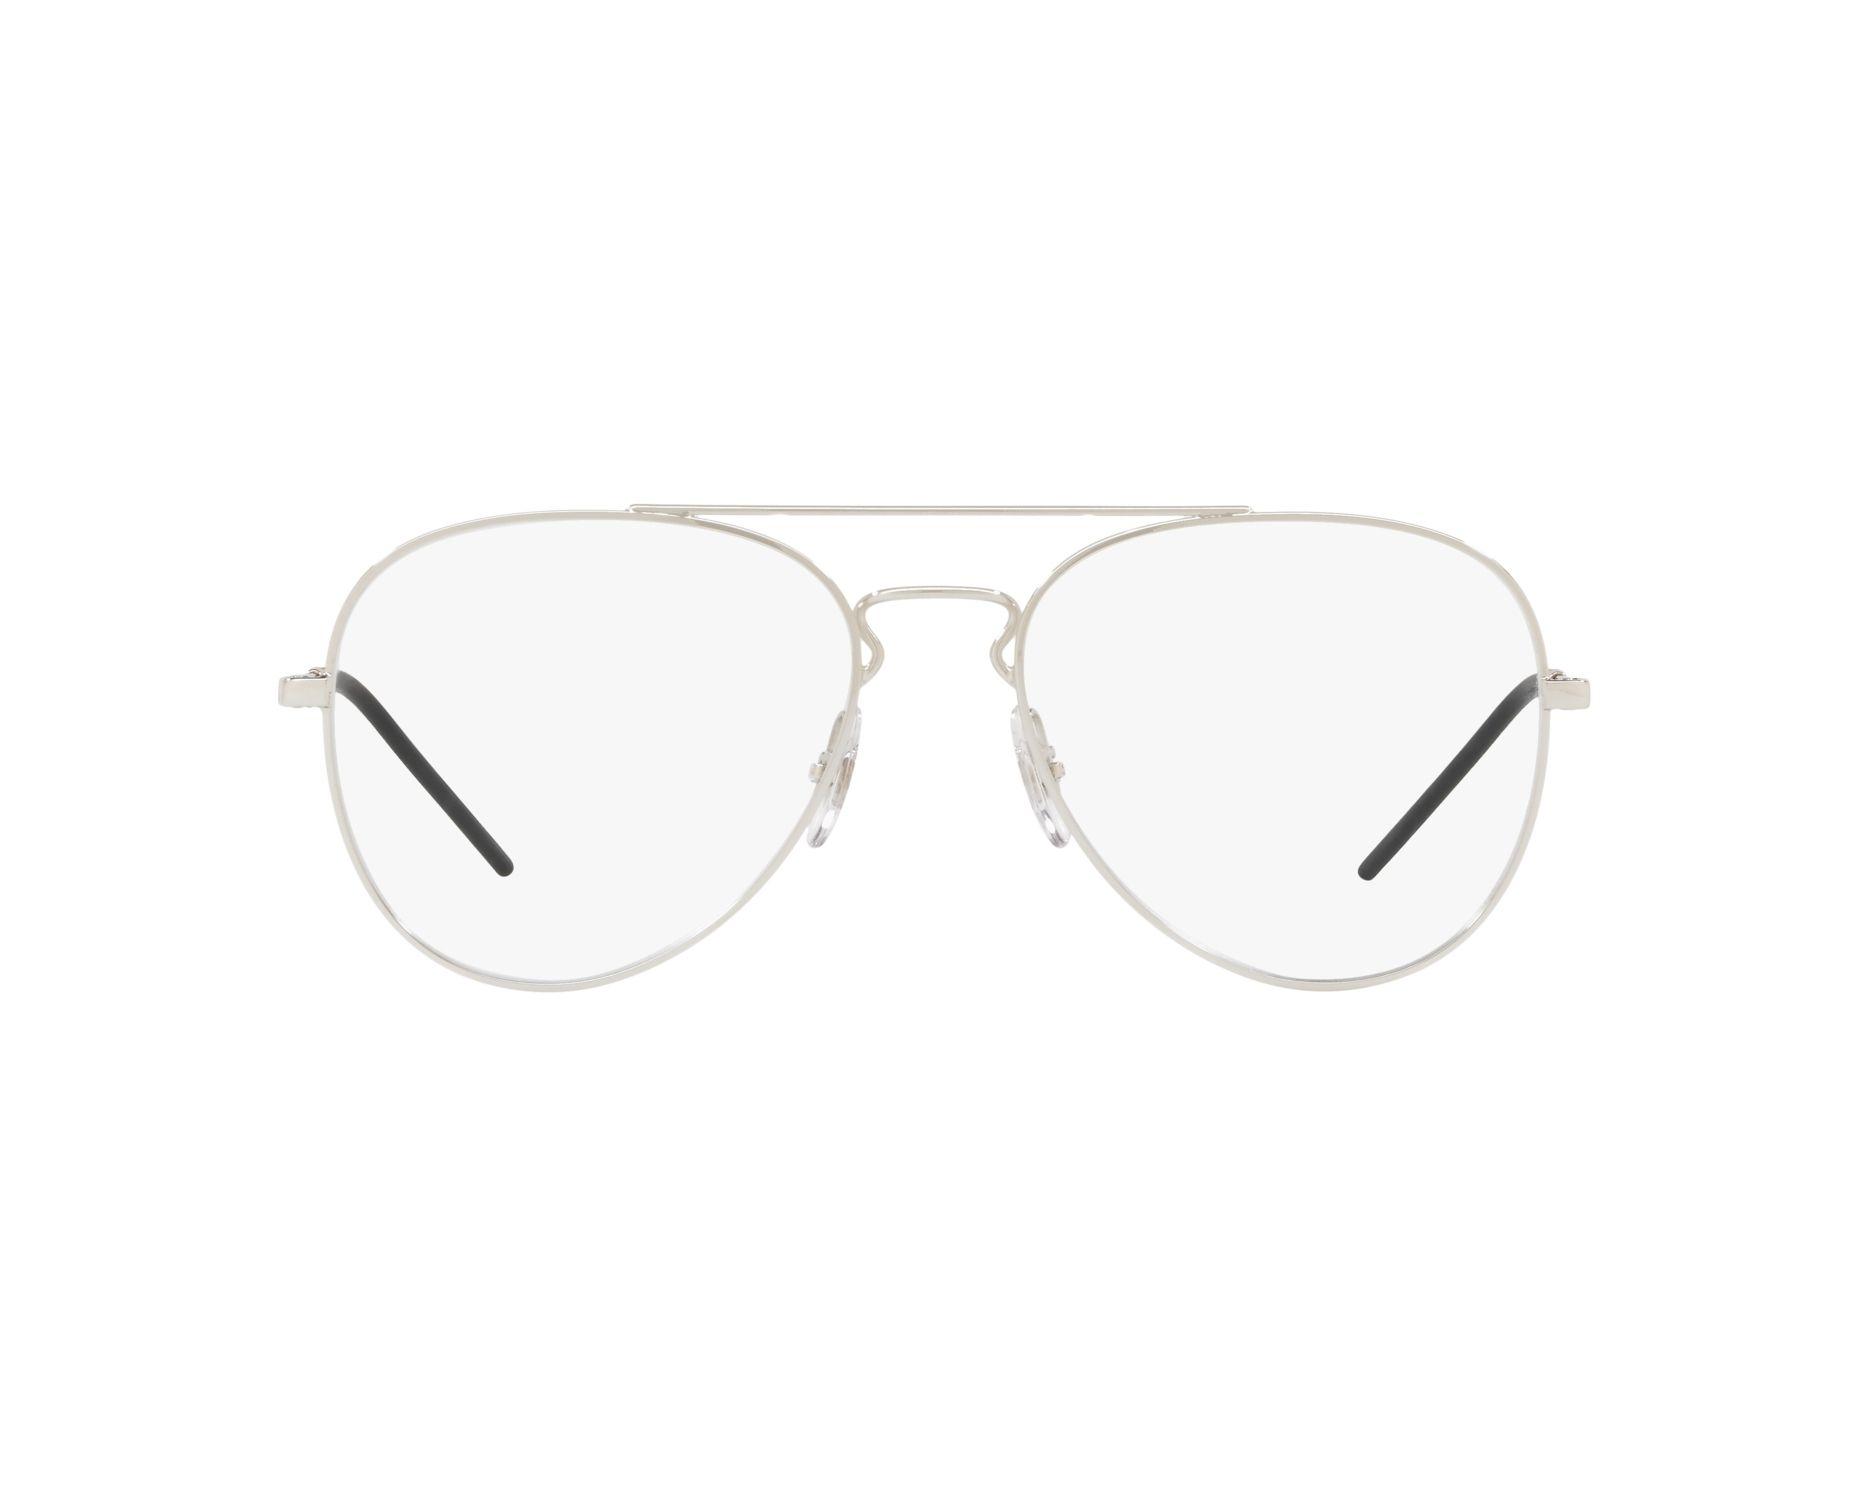 54fc11a38b2 eyeglasses Ray-Ban RX-6413 2501 54-17 Silver 360 degree view 1